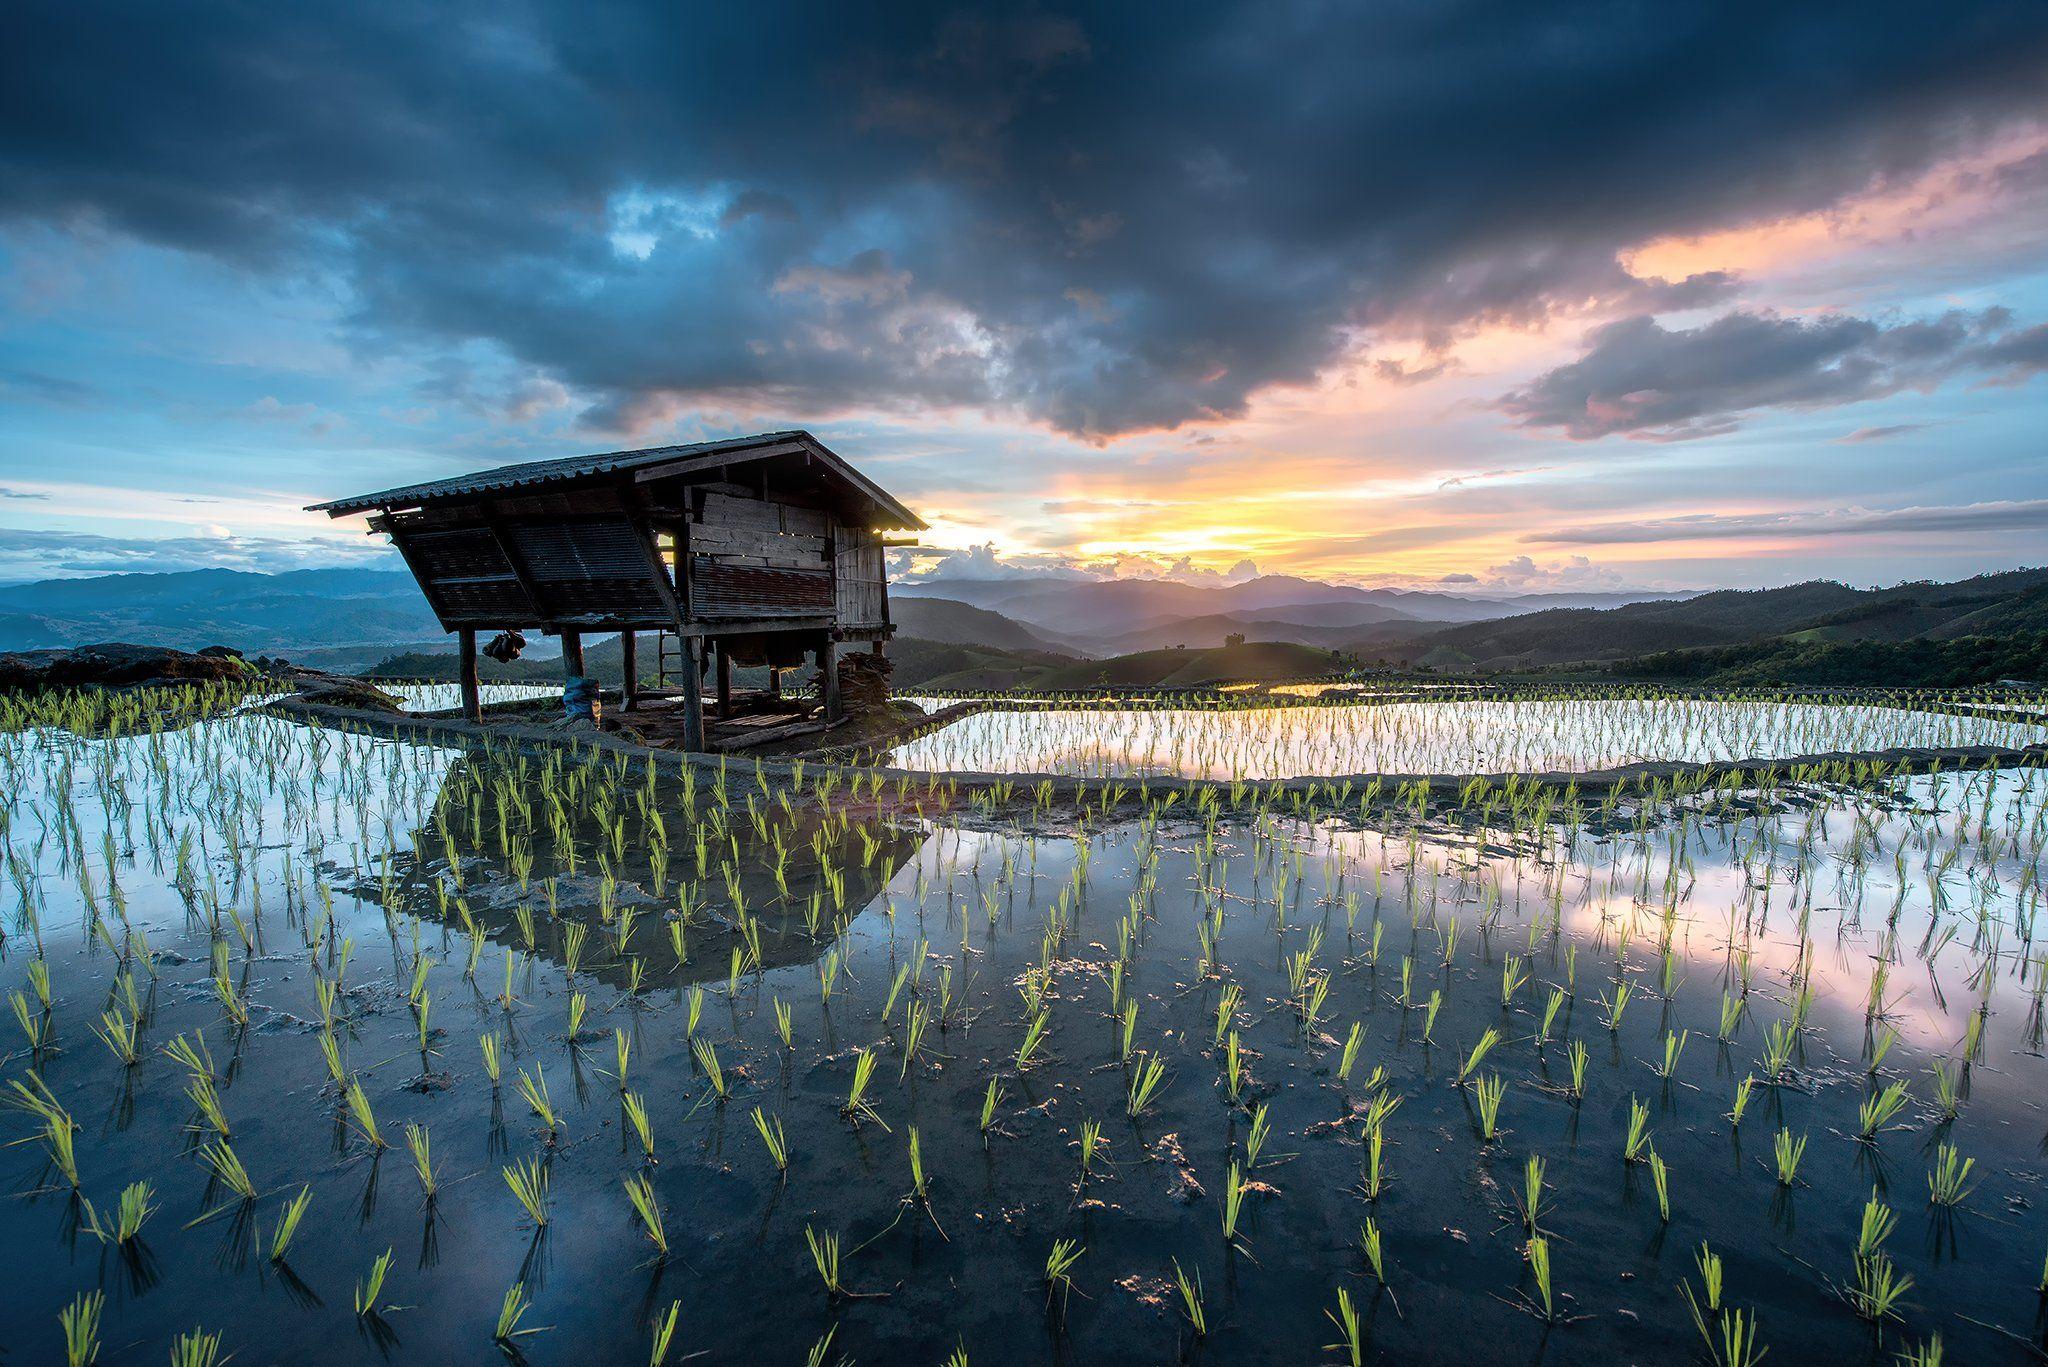 thai,rice,sky,home,refection, sarawut intarob